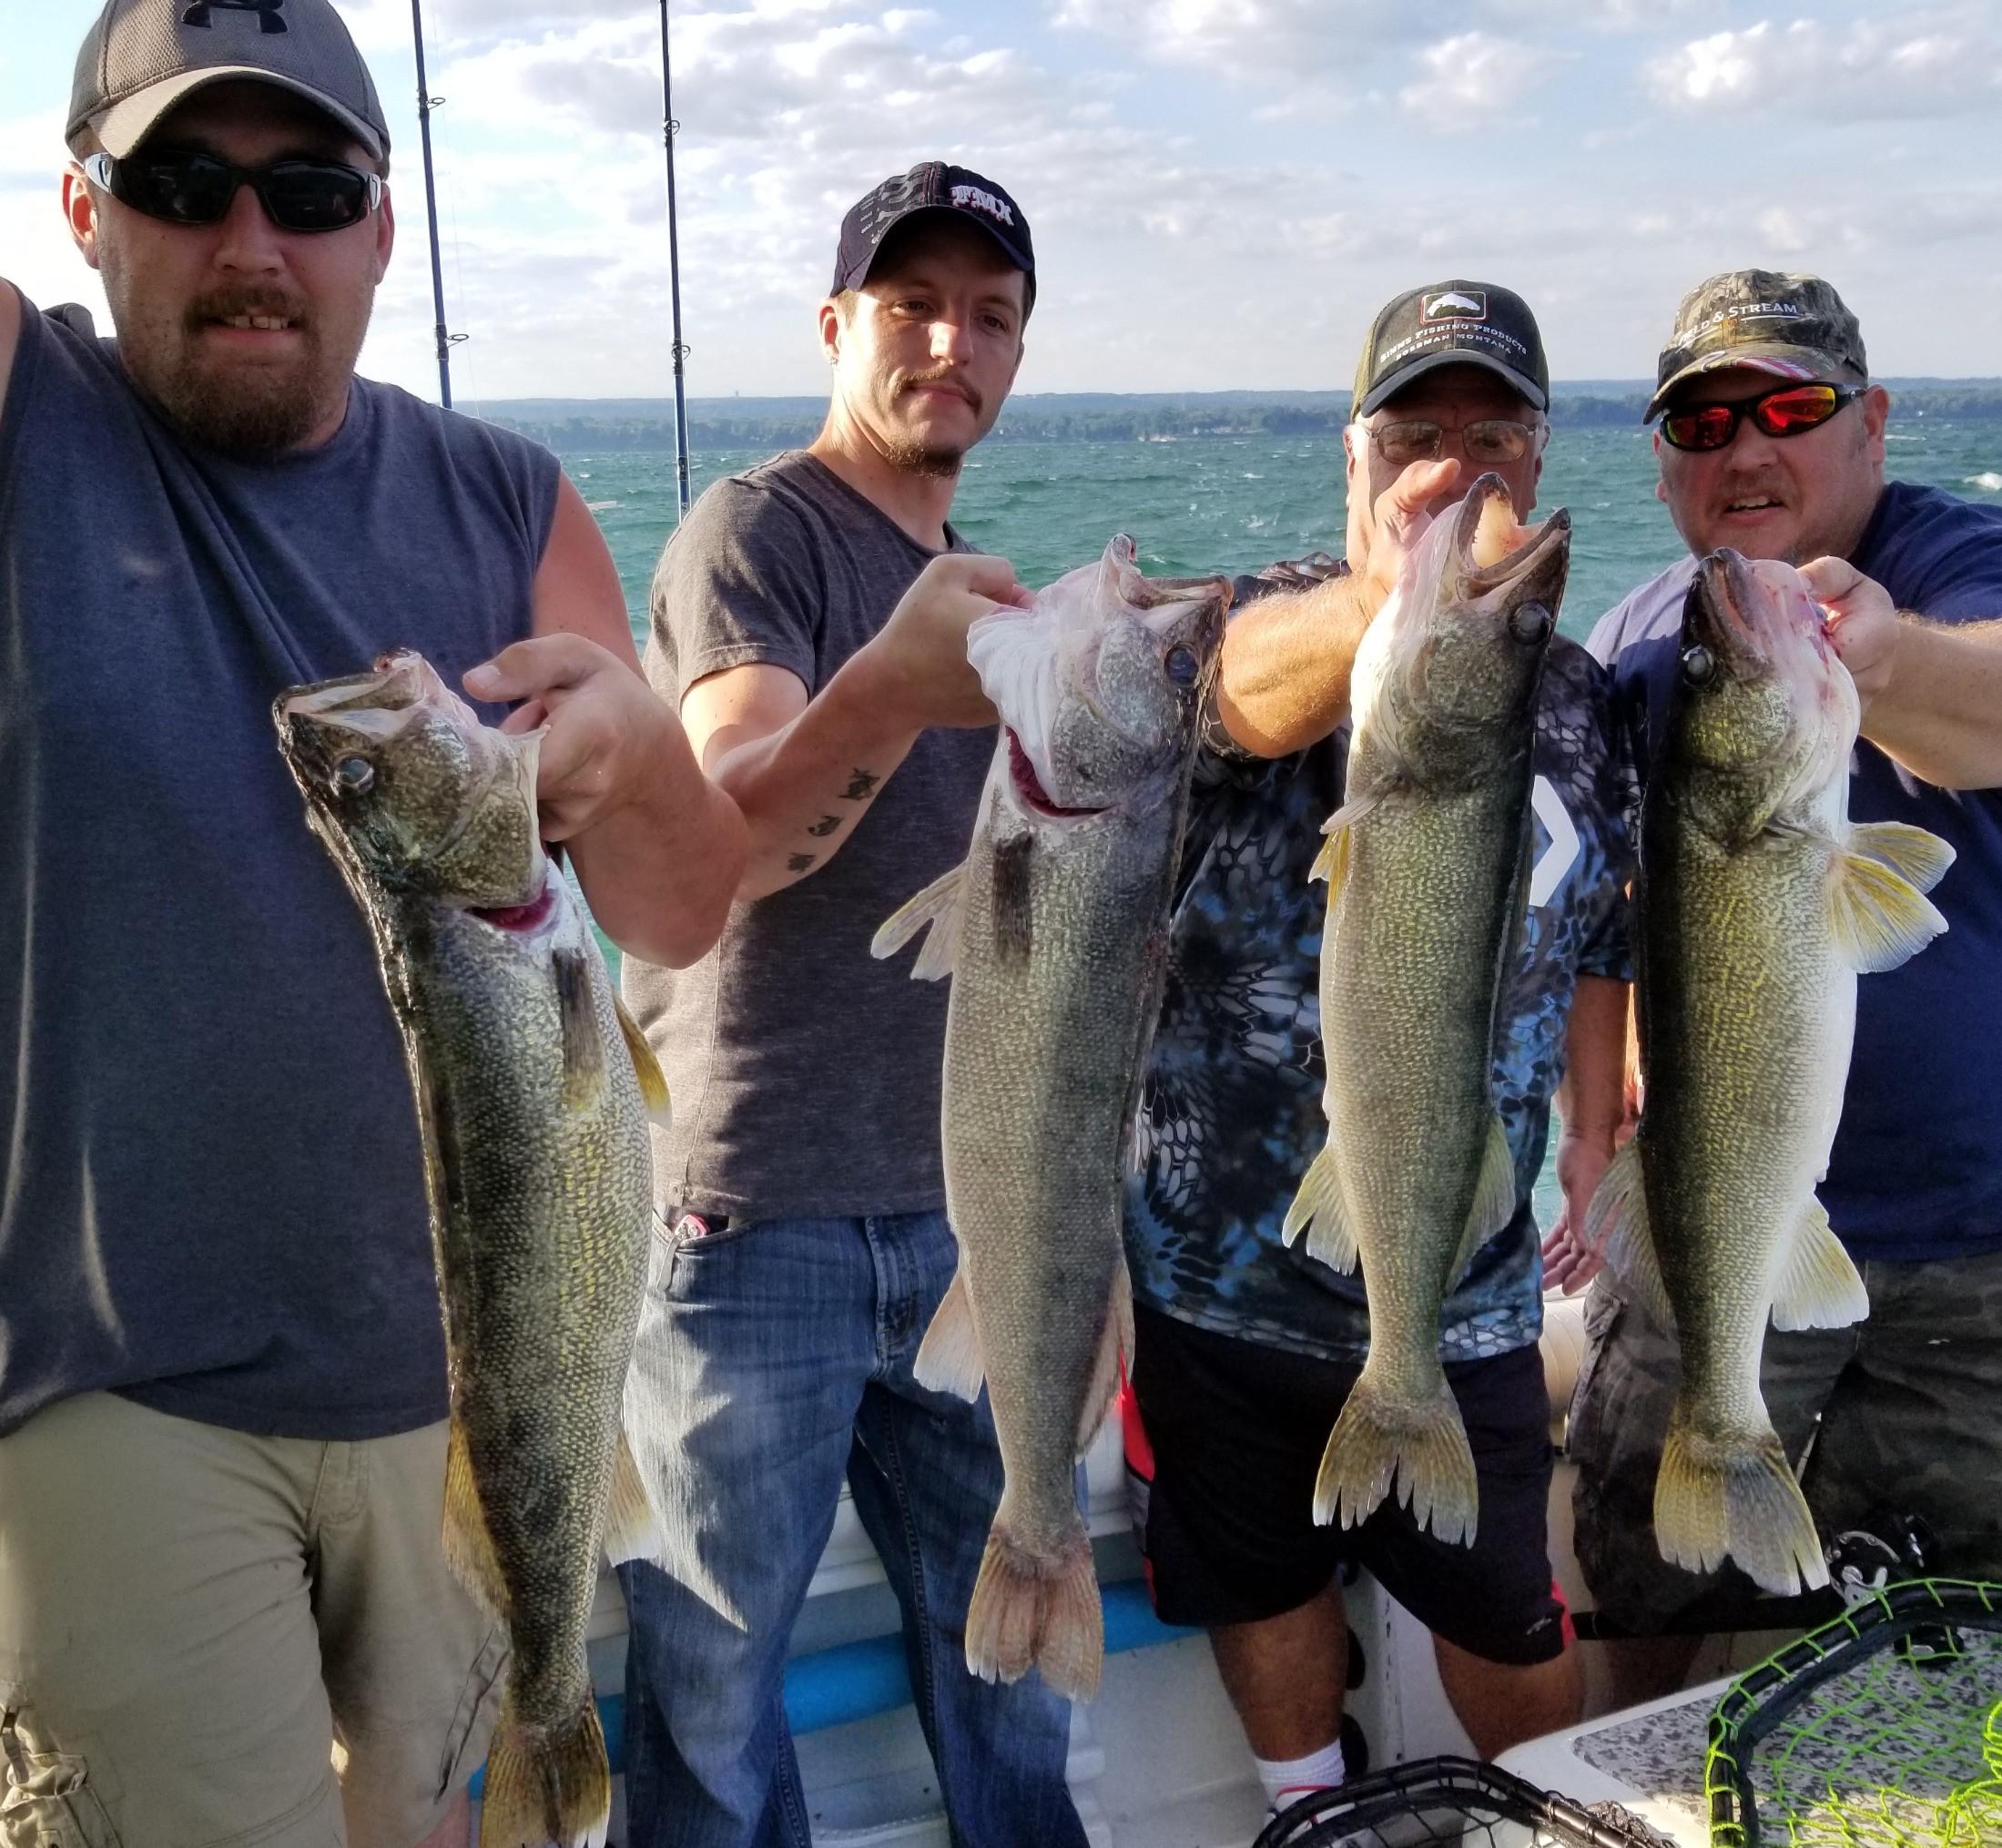 Full Day Fishing Trip (1 - 5 anglers)